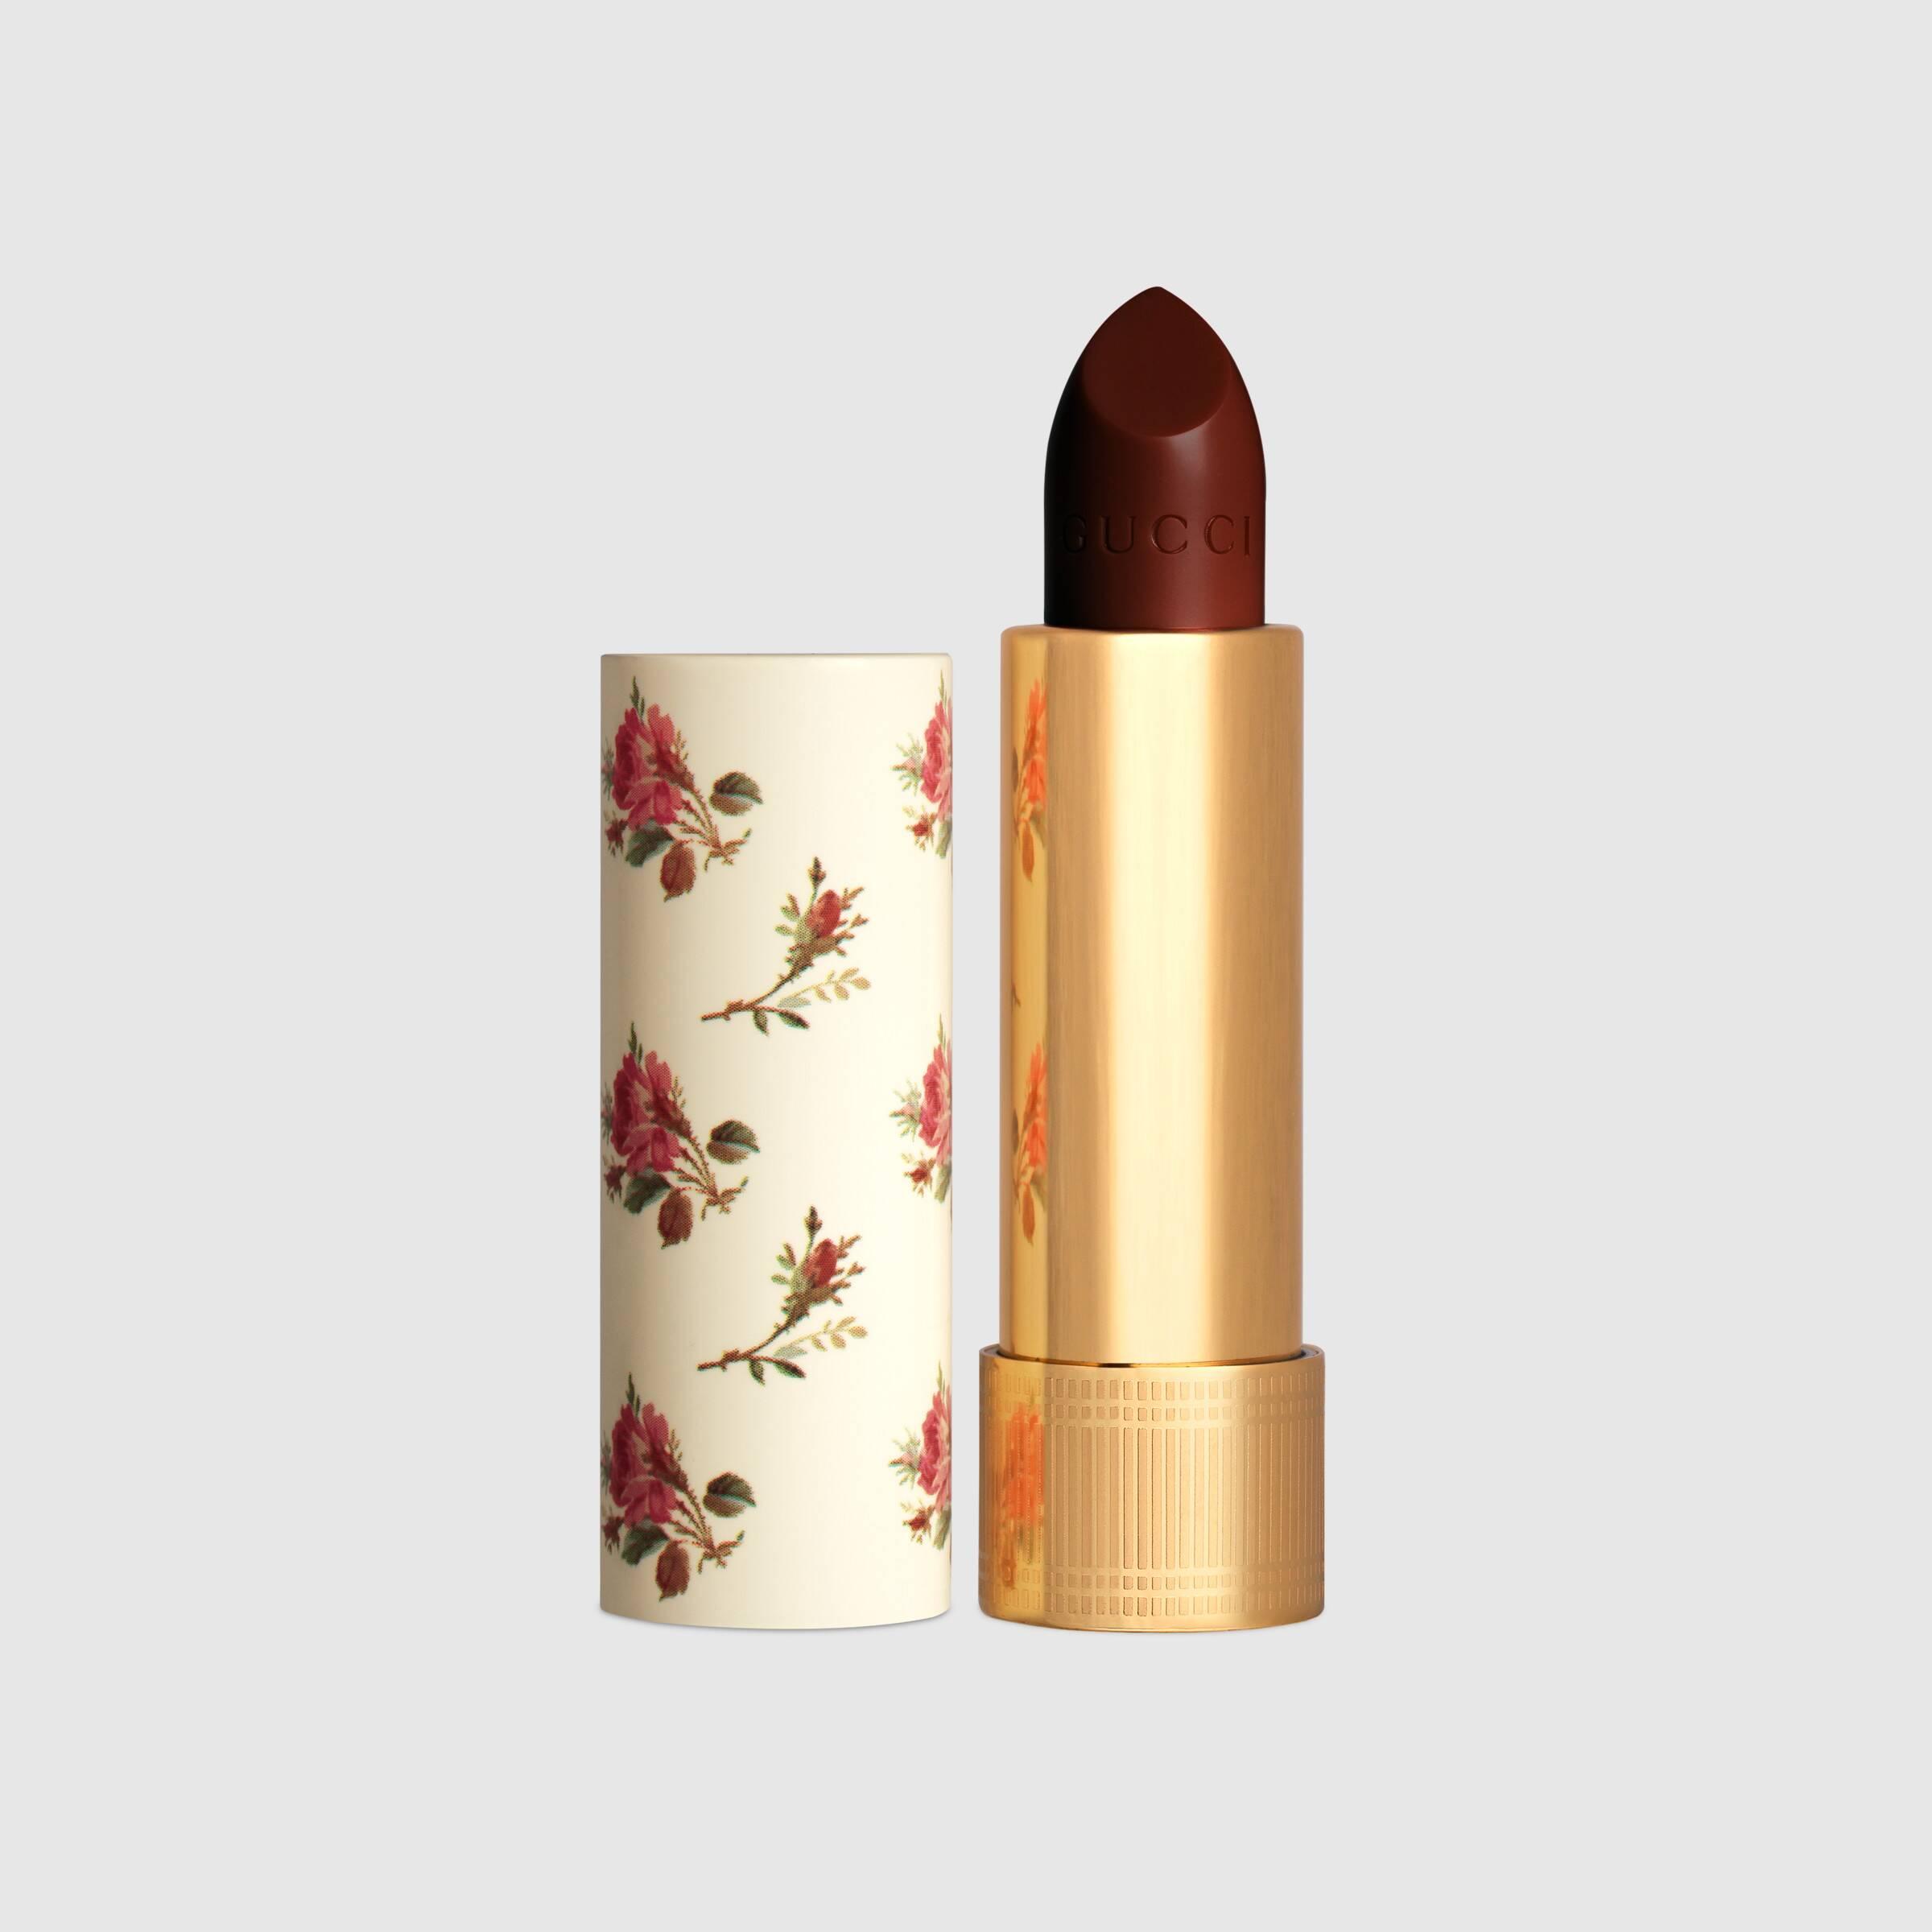 Rouge à Lèvres Voile Lipstick in 110 Marguerite Jade